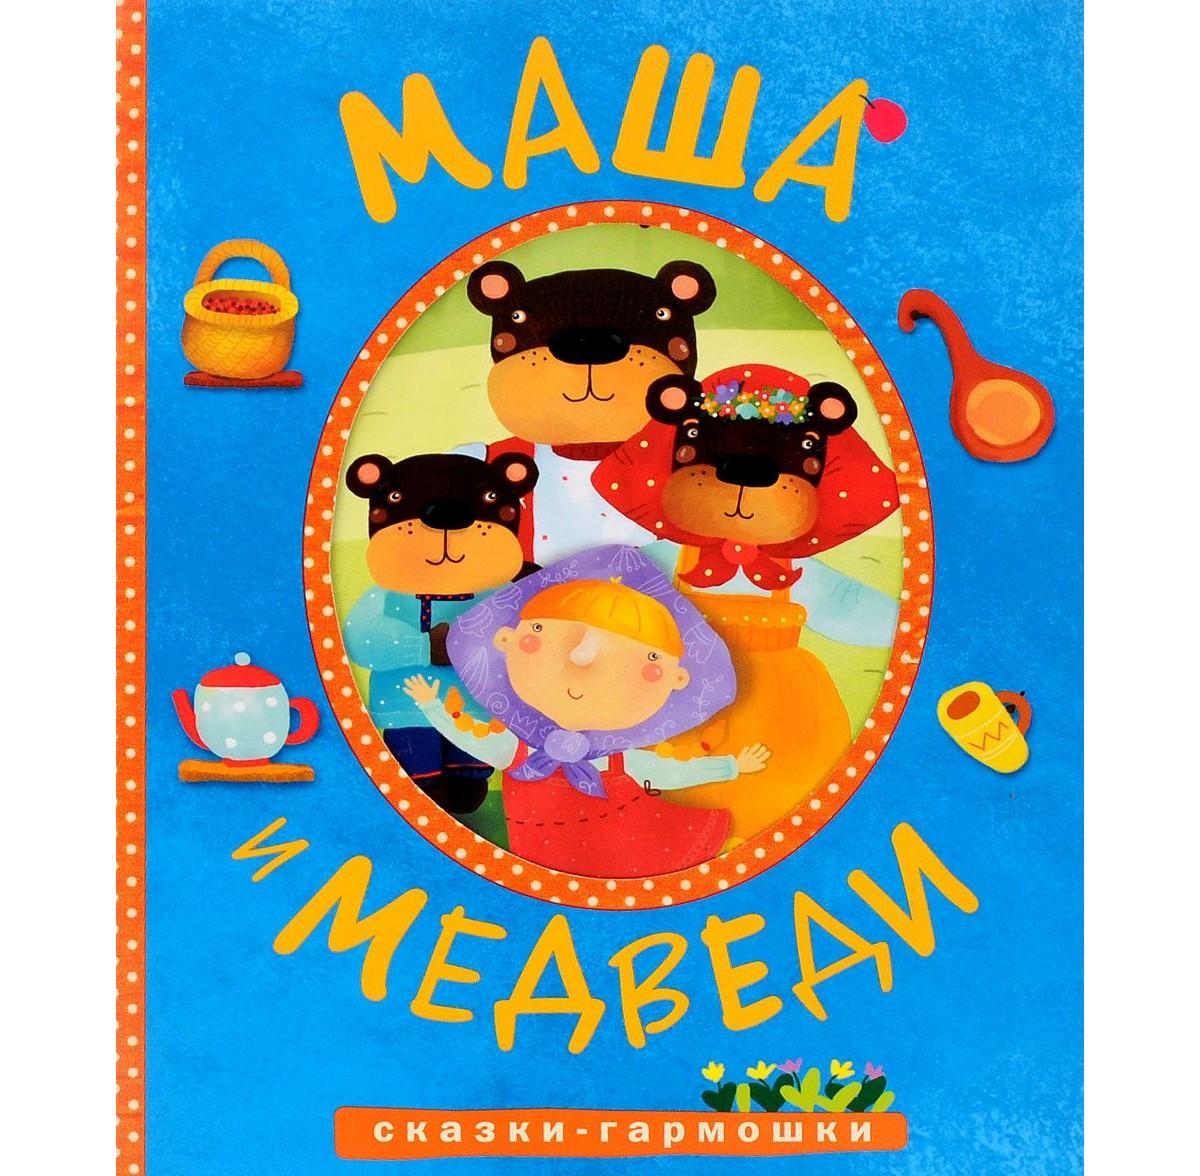 Книга - Сказки-гармошки. Маша и медведиБибилиотека детского сада<br>Книга - Сказки-гармошки. Маша и медведи<br>